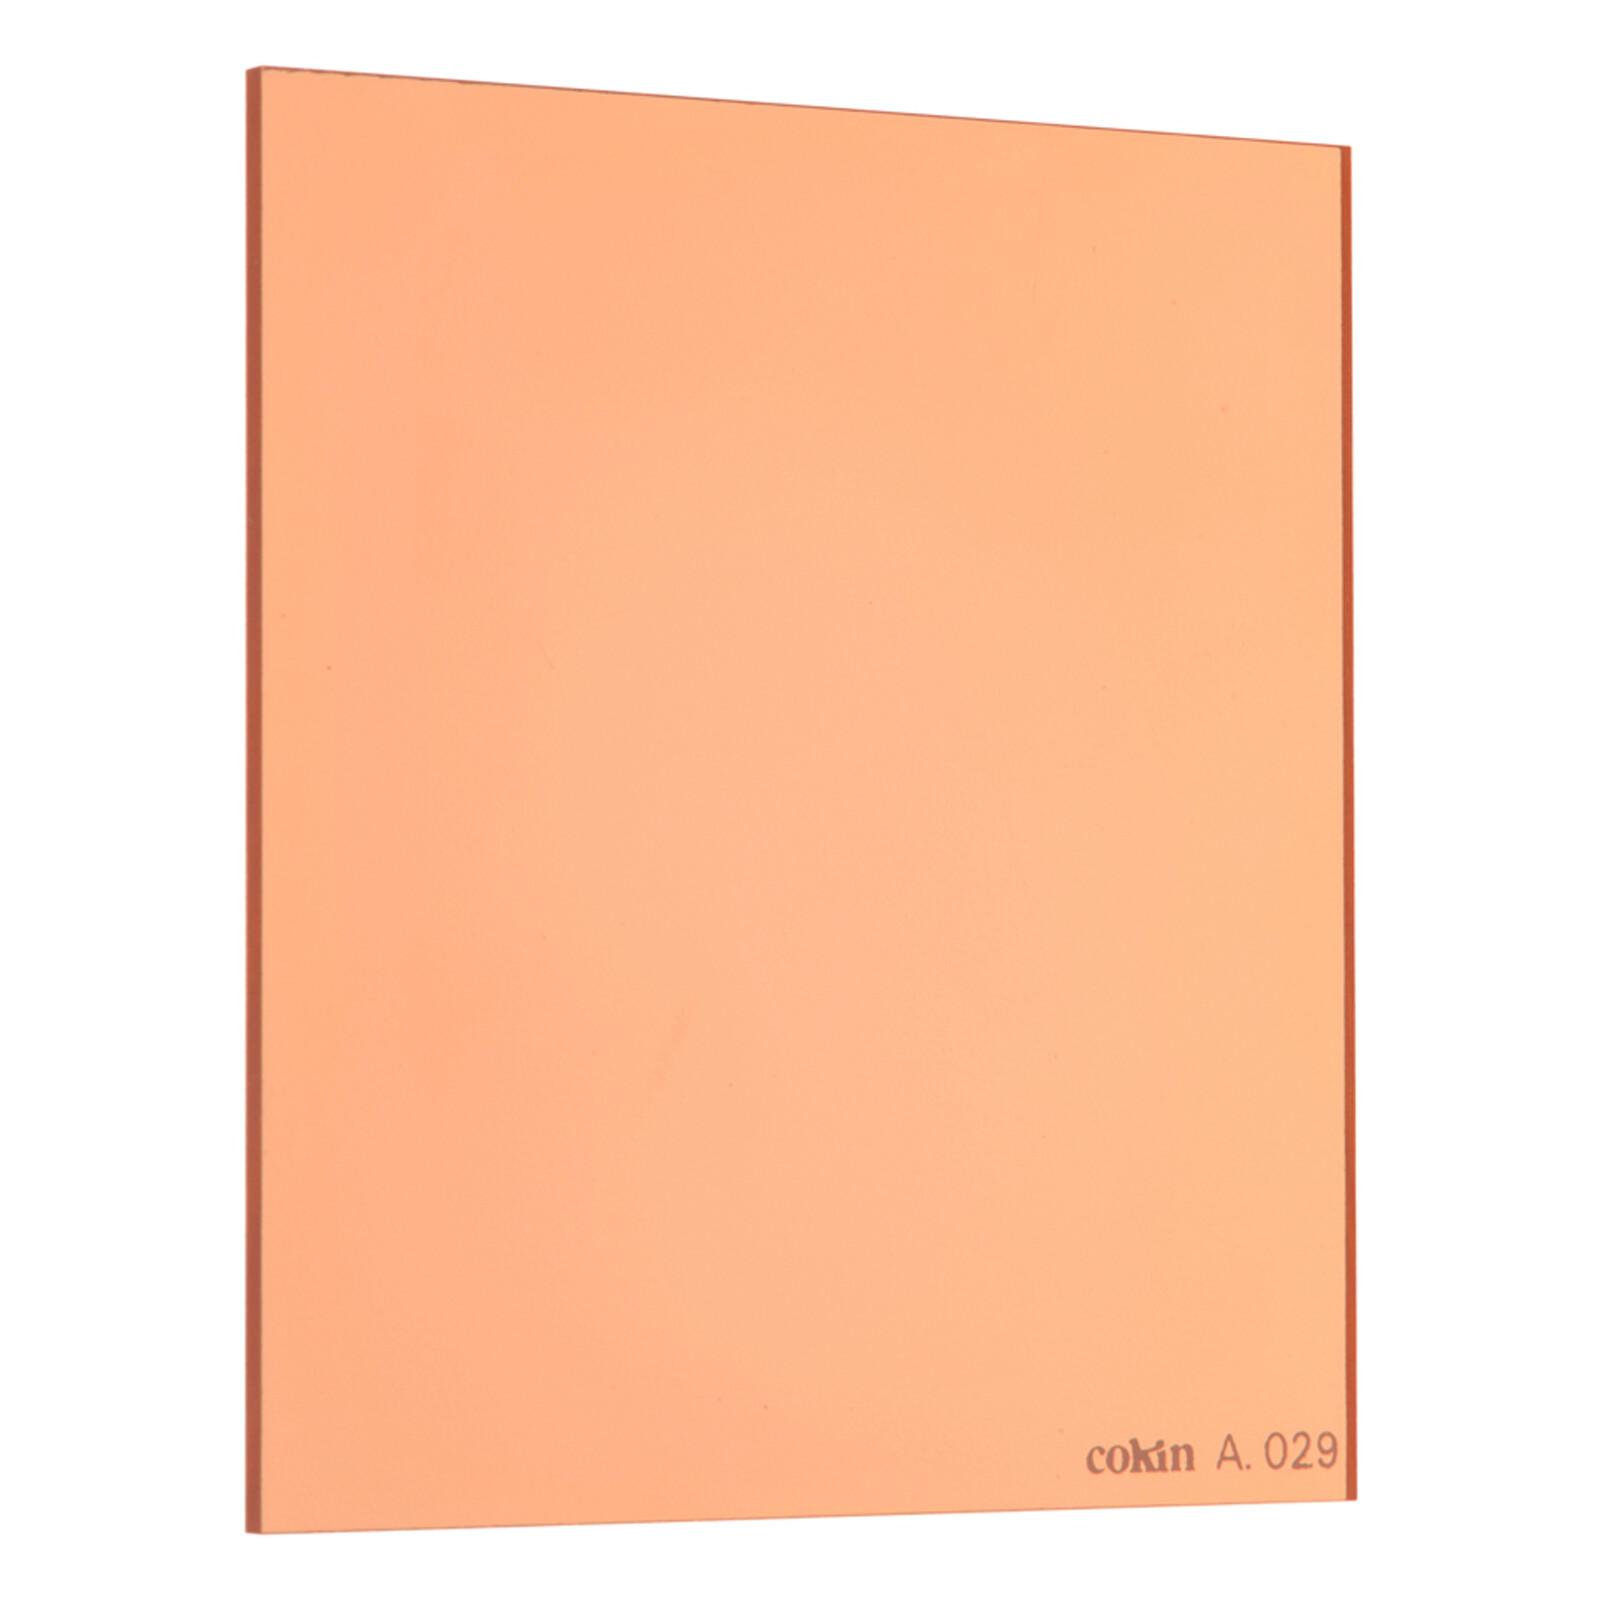 Cokin A029 Orange 85A